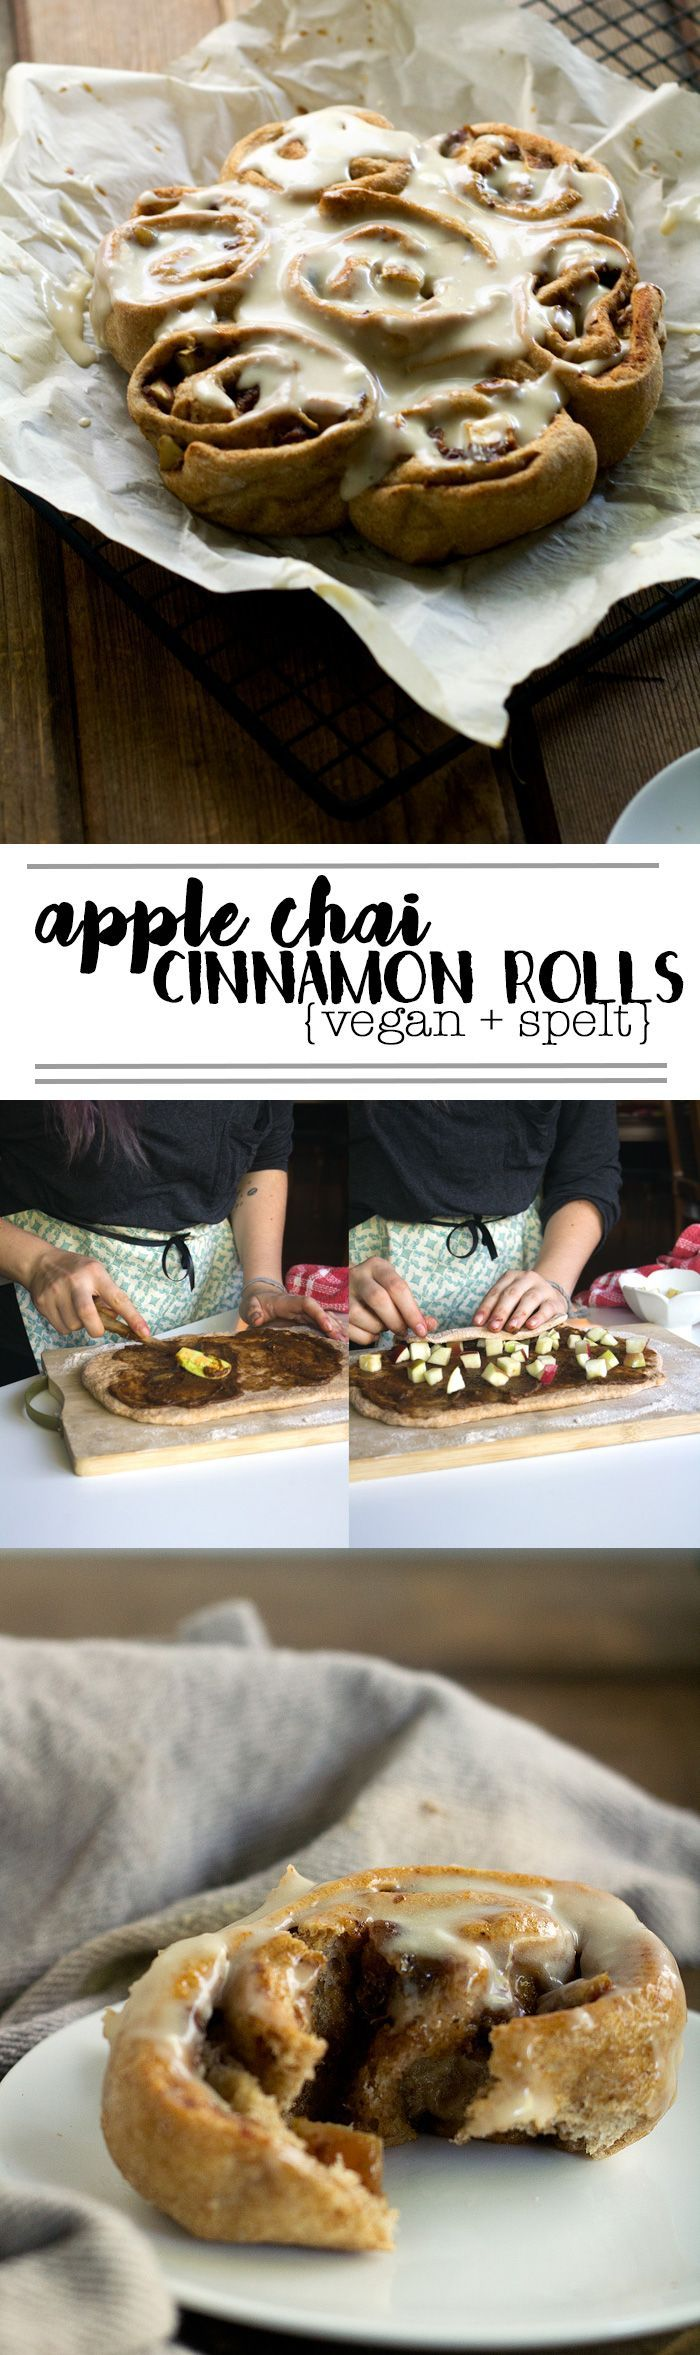 vegan apple chai cinnamon rolls made with spelt flour | love me, feed me